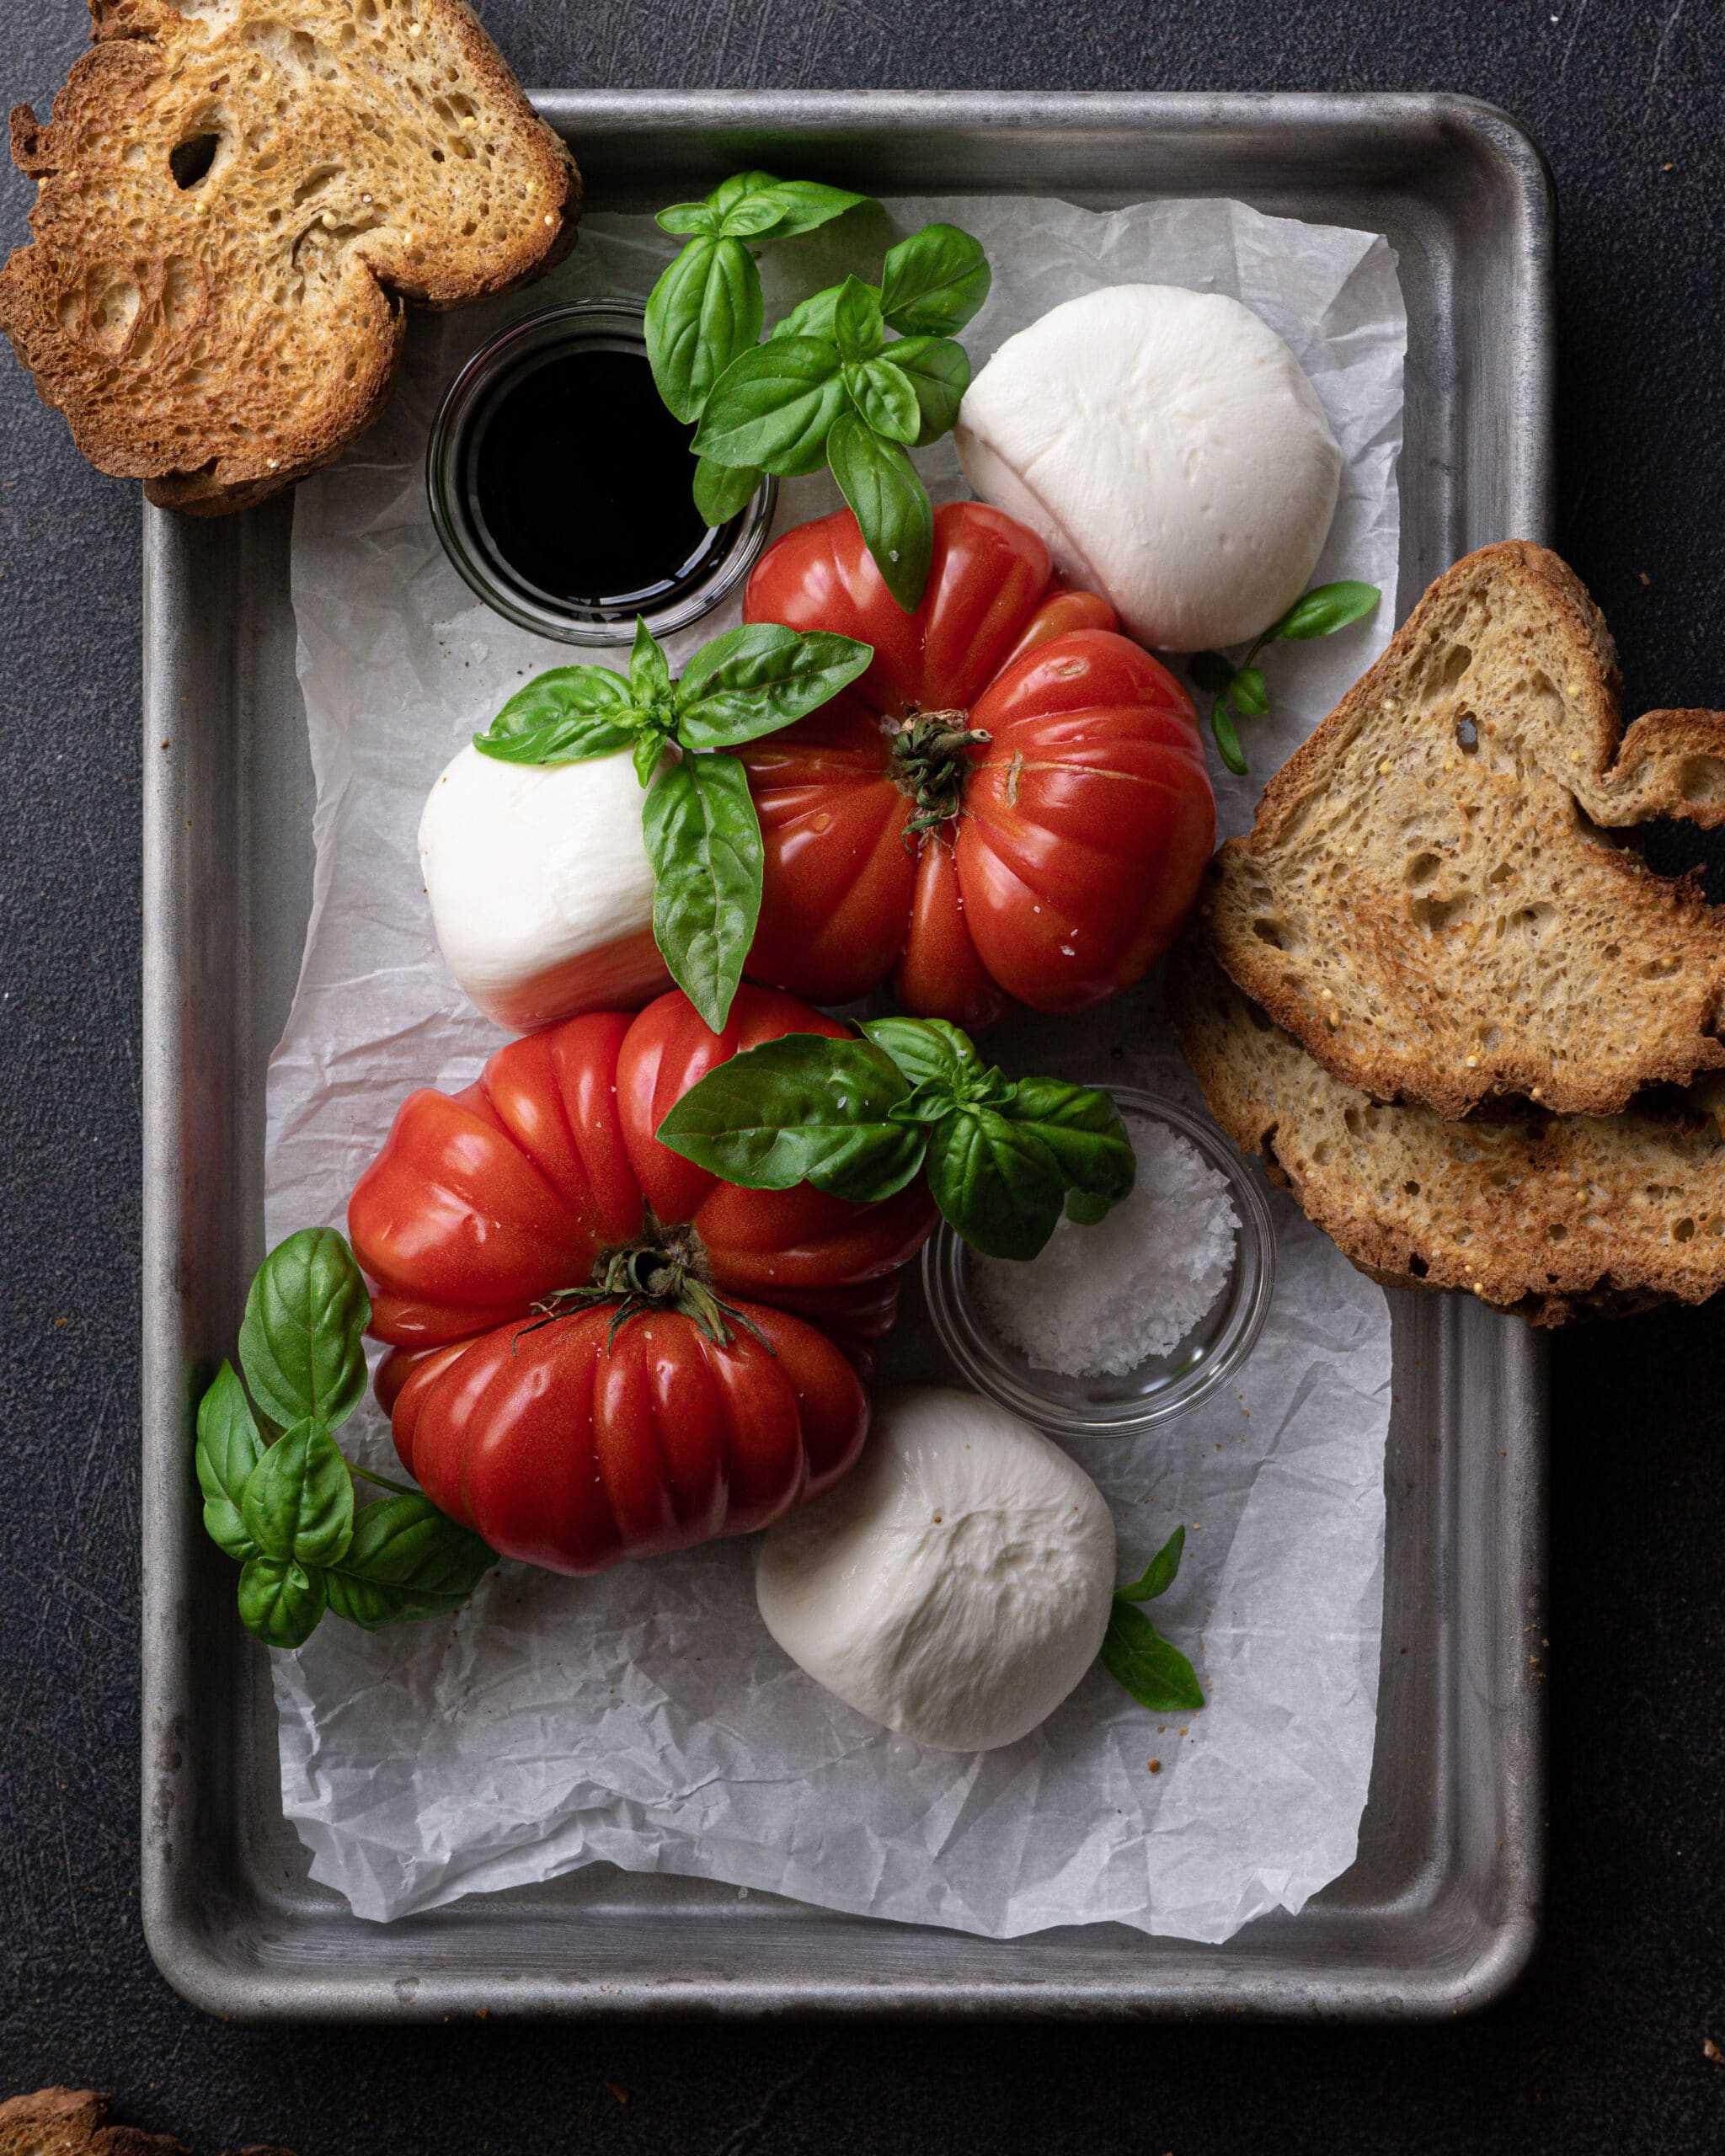 A sheet pan with heirloom tomatoes, burrata, basil, toast, balsamic glaze and salt.